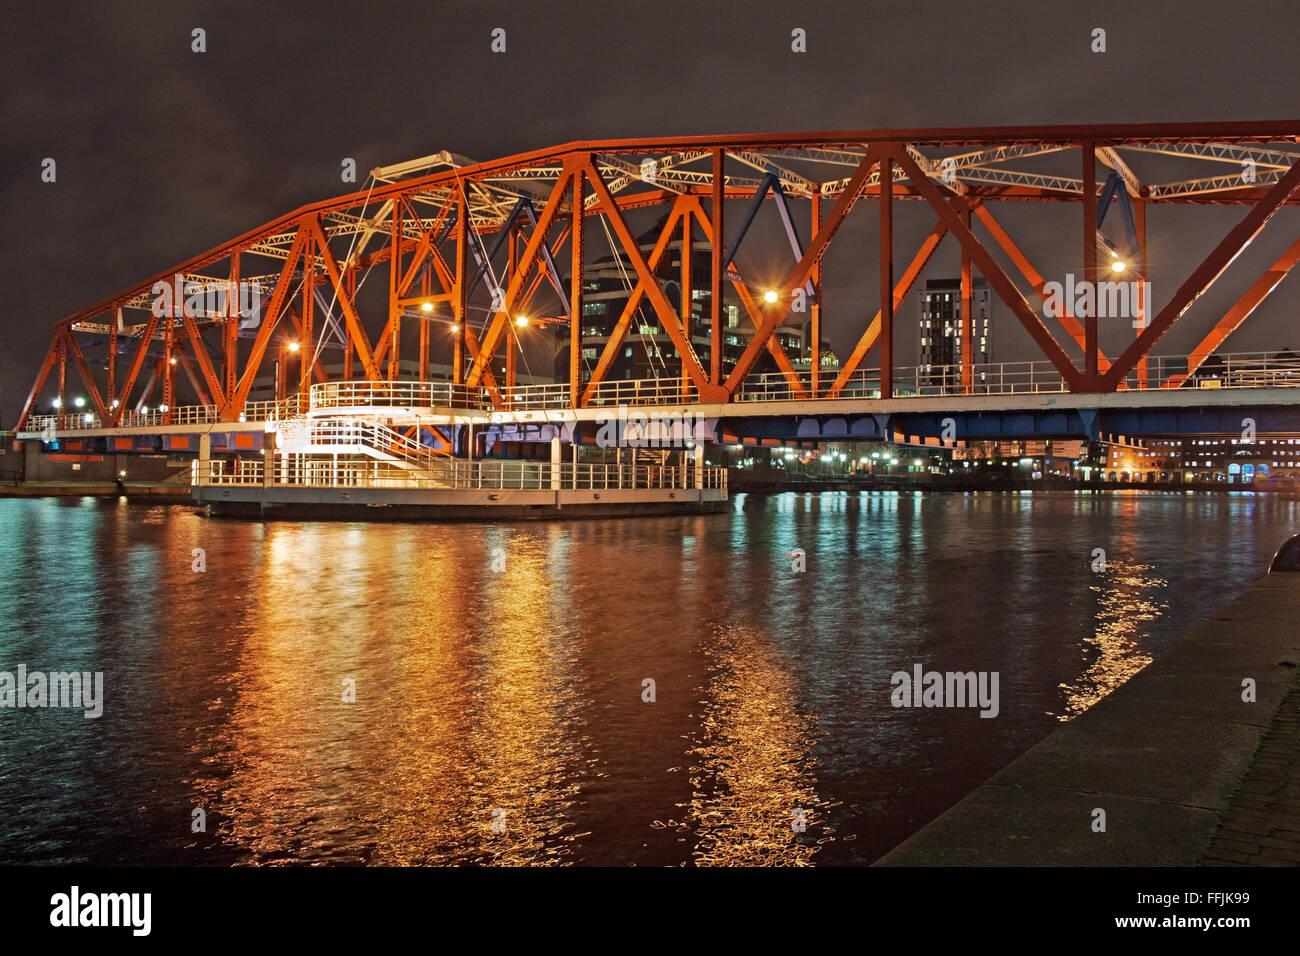 The rotating bridge at night. Salford Quays, Manchester - Stock Image